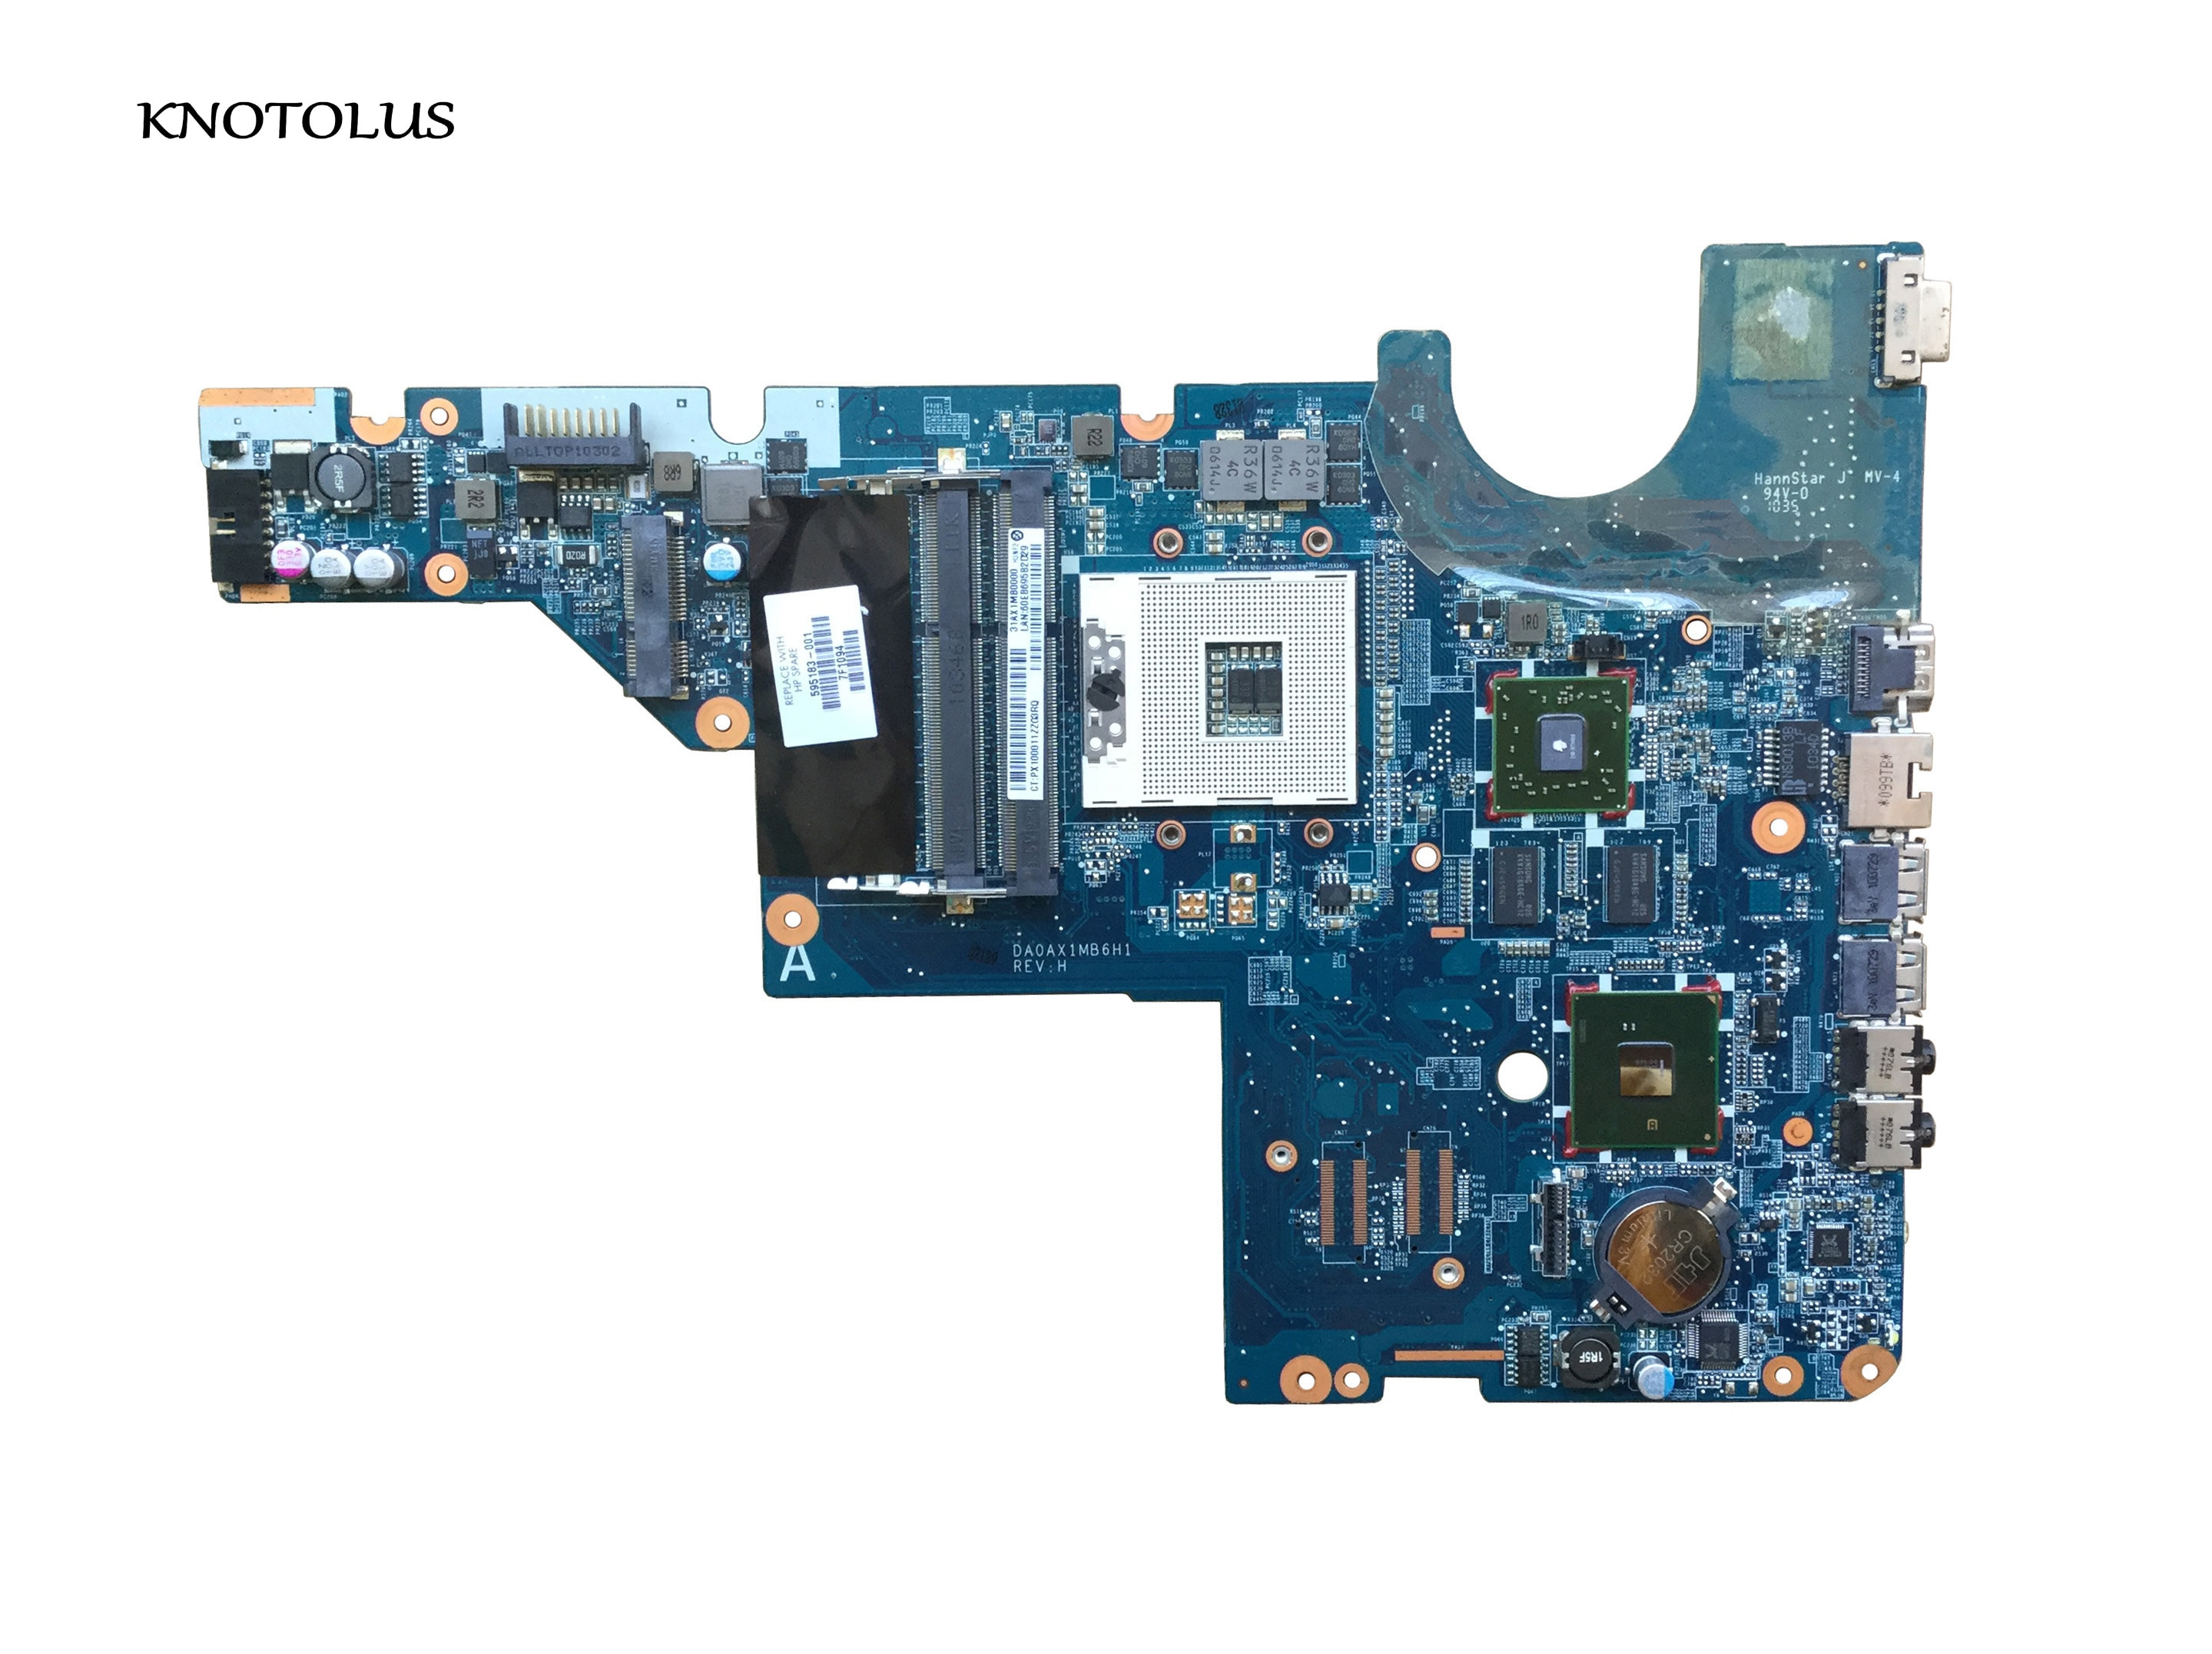 Placa base para ordenador portátil 595183-001 para HP CQ42 G42 G62 CQ62, DAOAX1MB6F0 DA0AX1MB6H0 DA0AX1MB6H1 DA0AX1MB6F1 100% probado